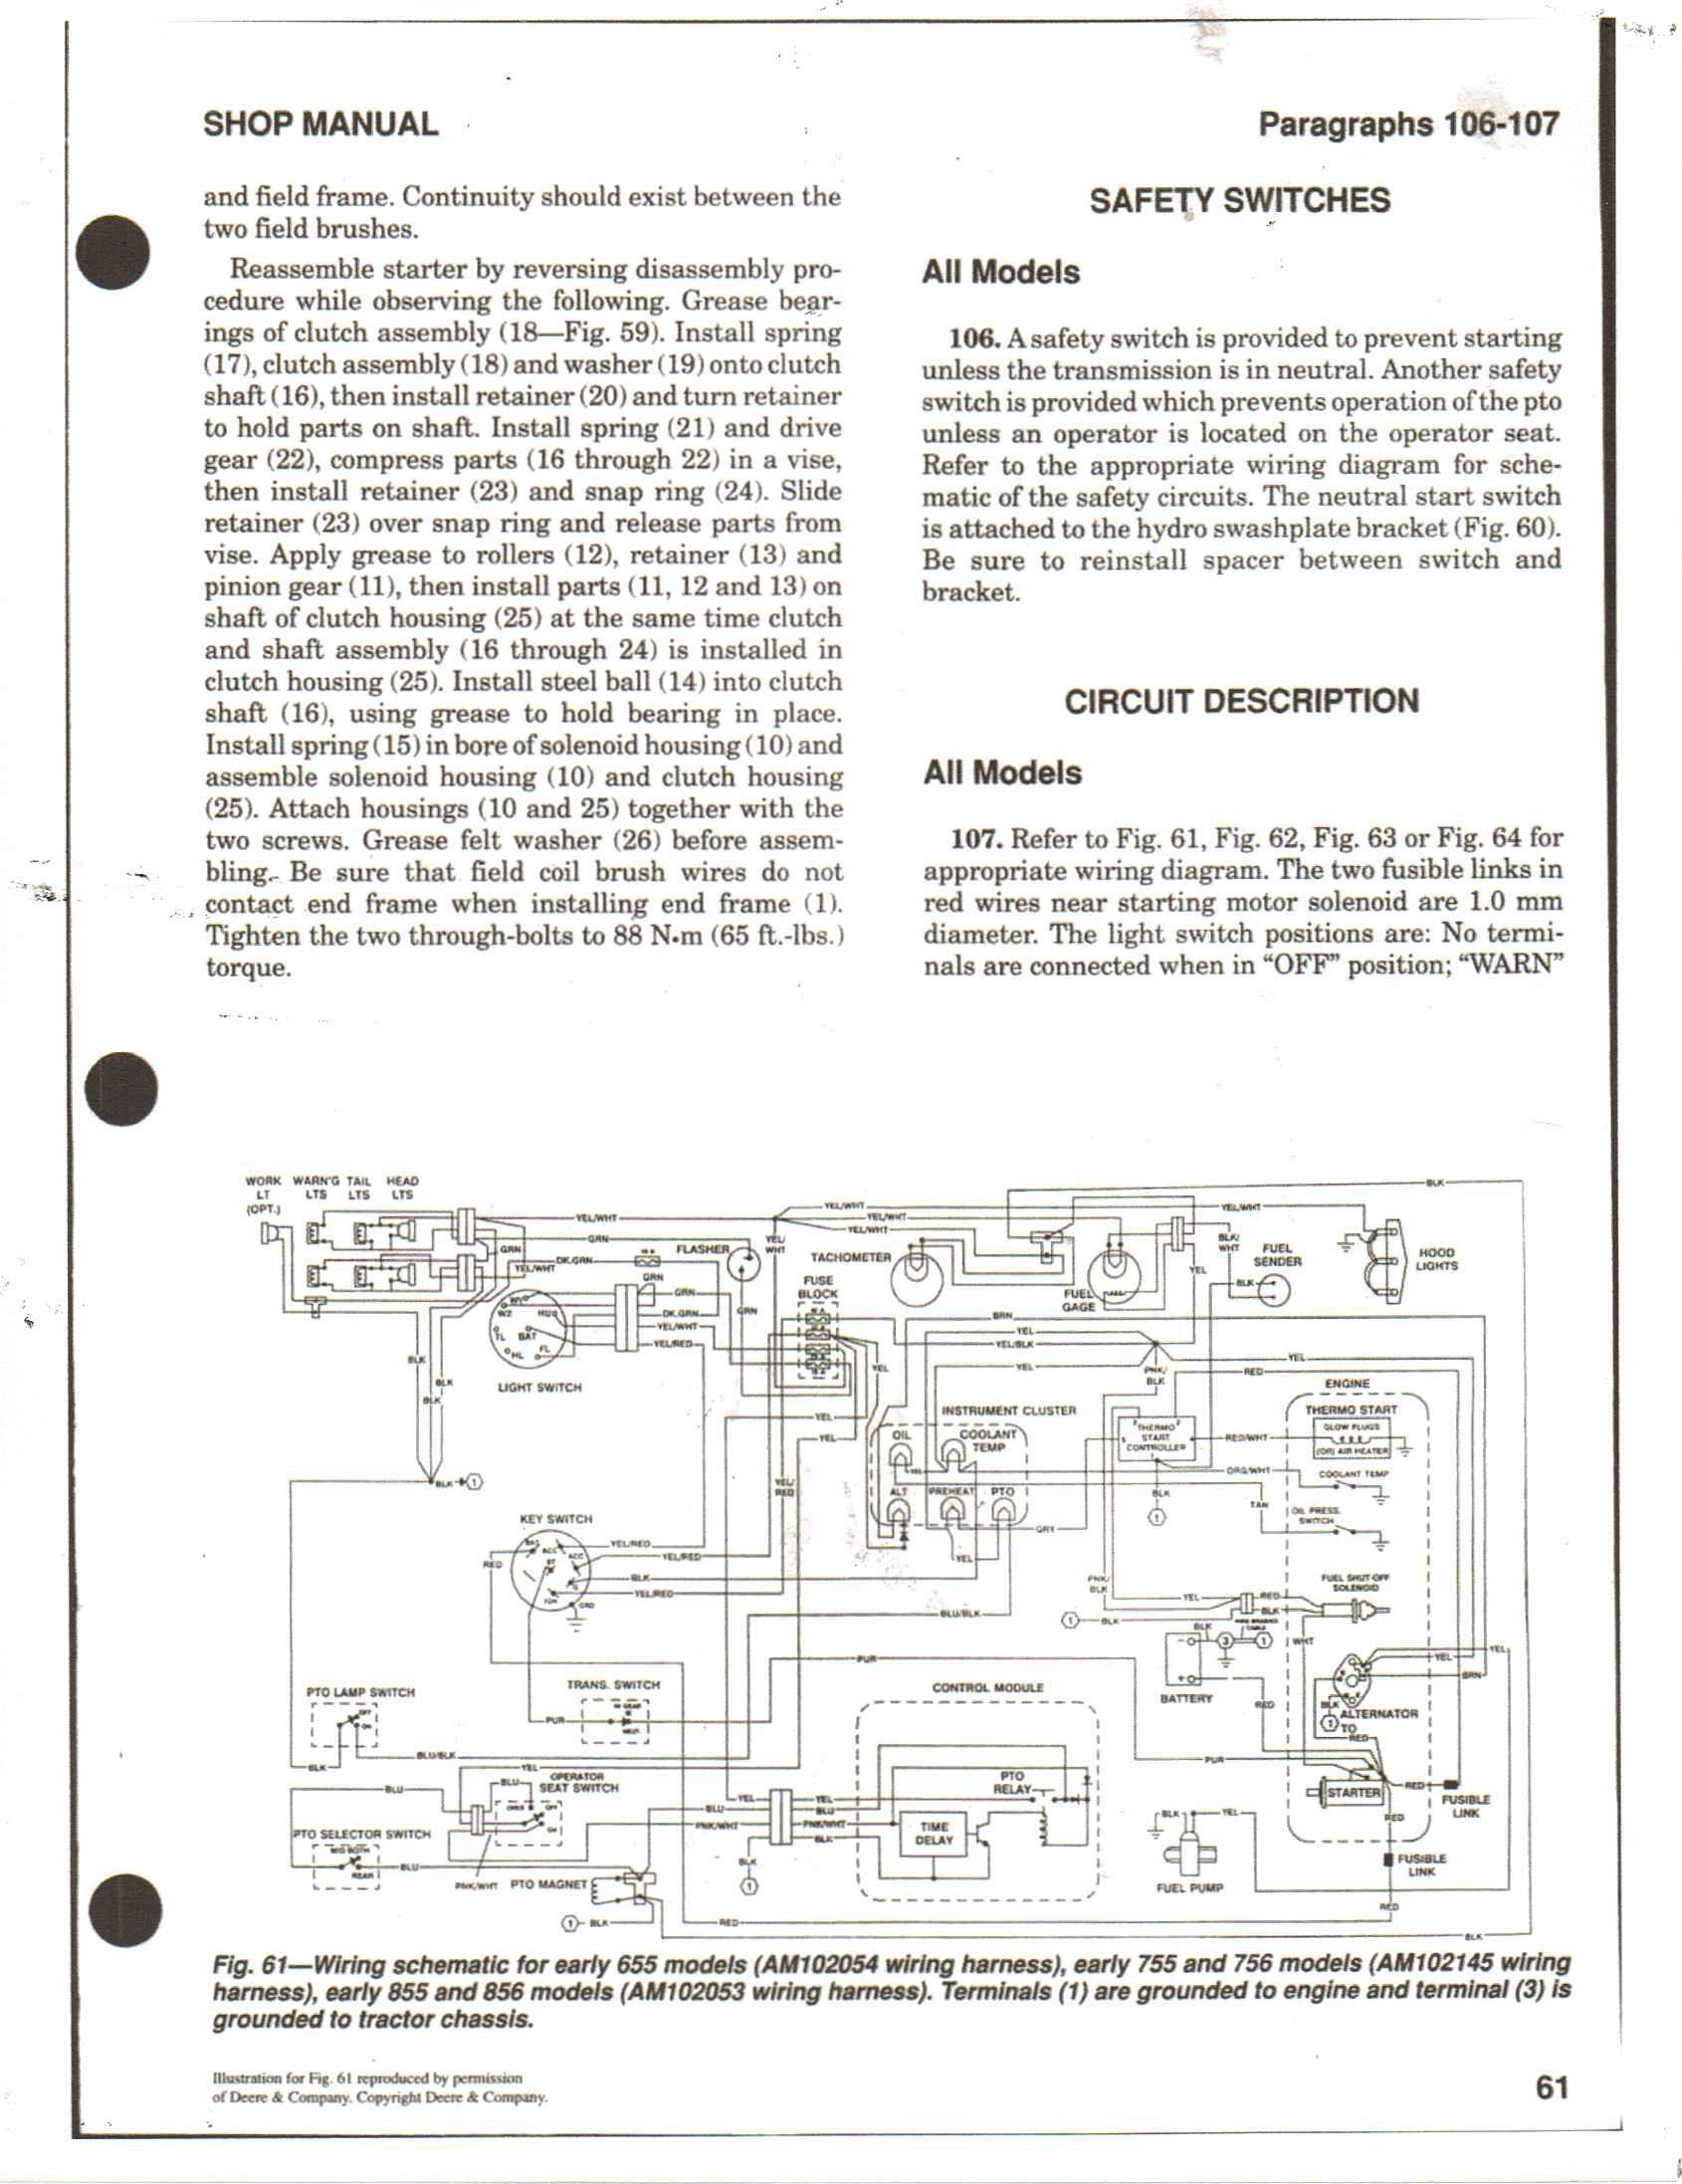 Jd 345 Electrical Diagram 56d25 John Deere 655 Wiring Diagram Of Jd 345 Electrical Diagram